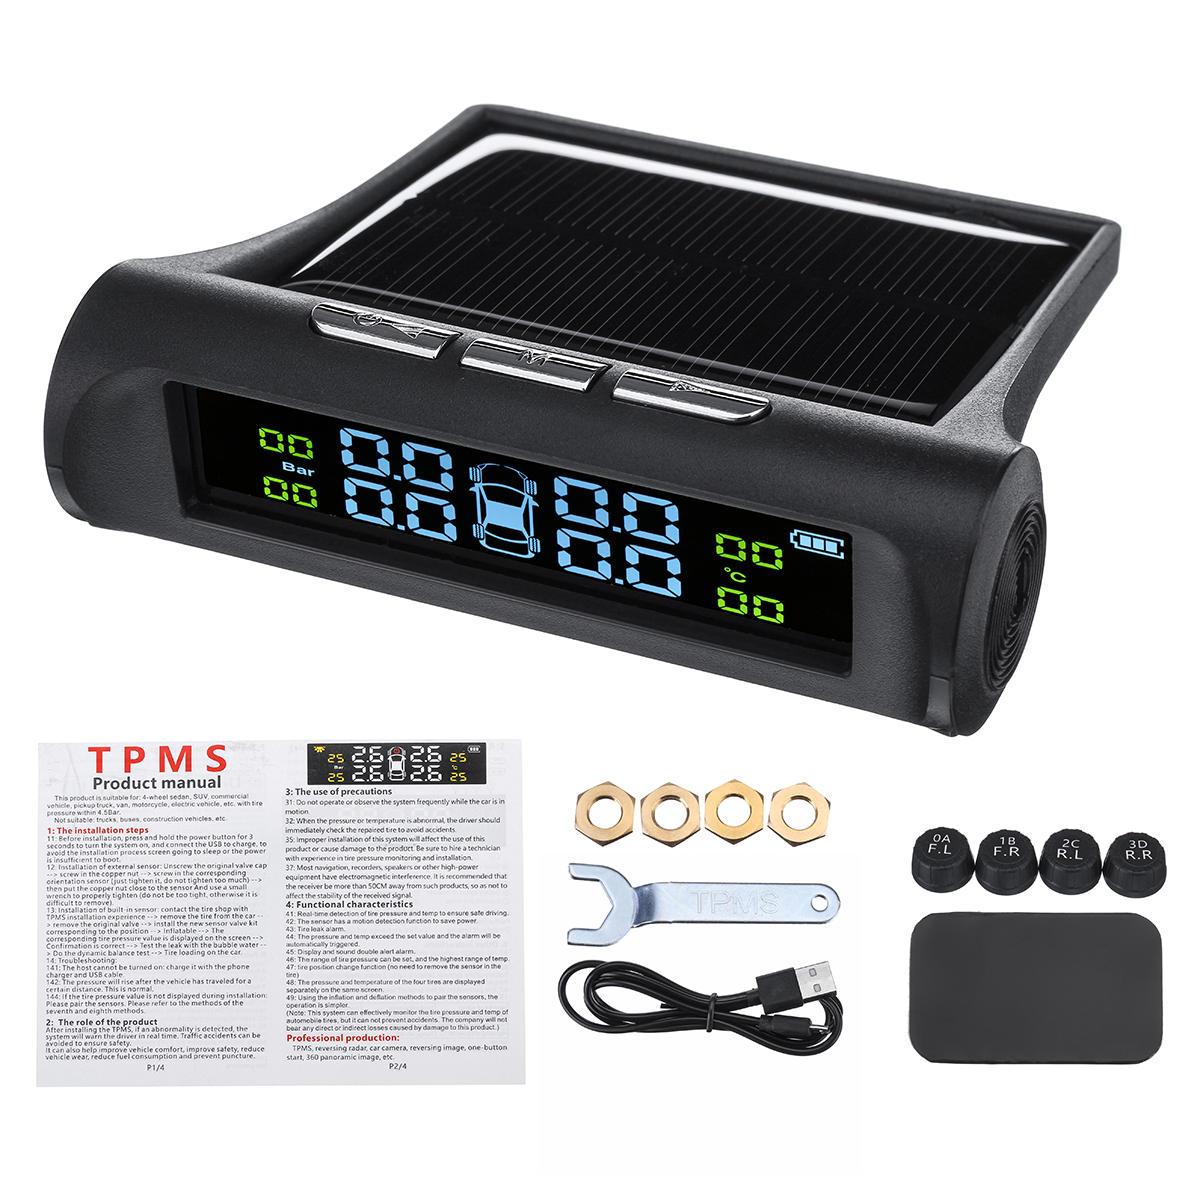 Solar TPMS Wireless Car Tire Pressure LCD Monitoring System 4 External Sensors